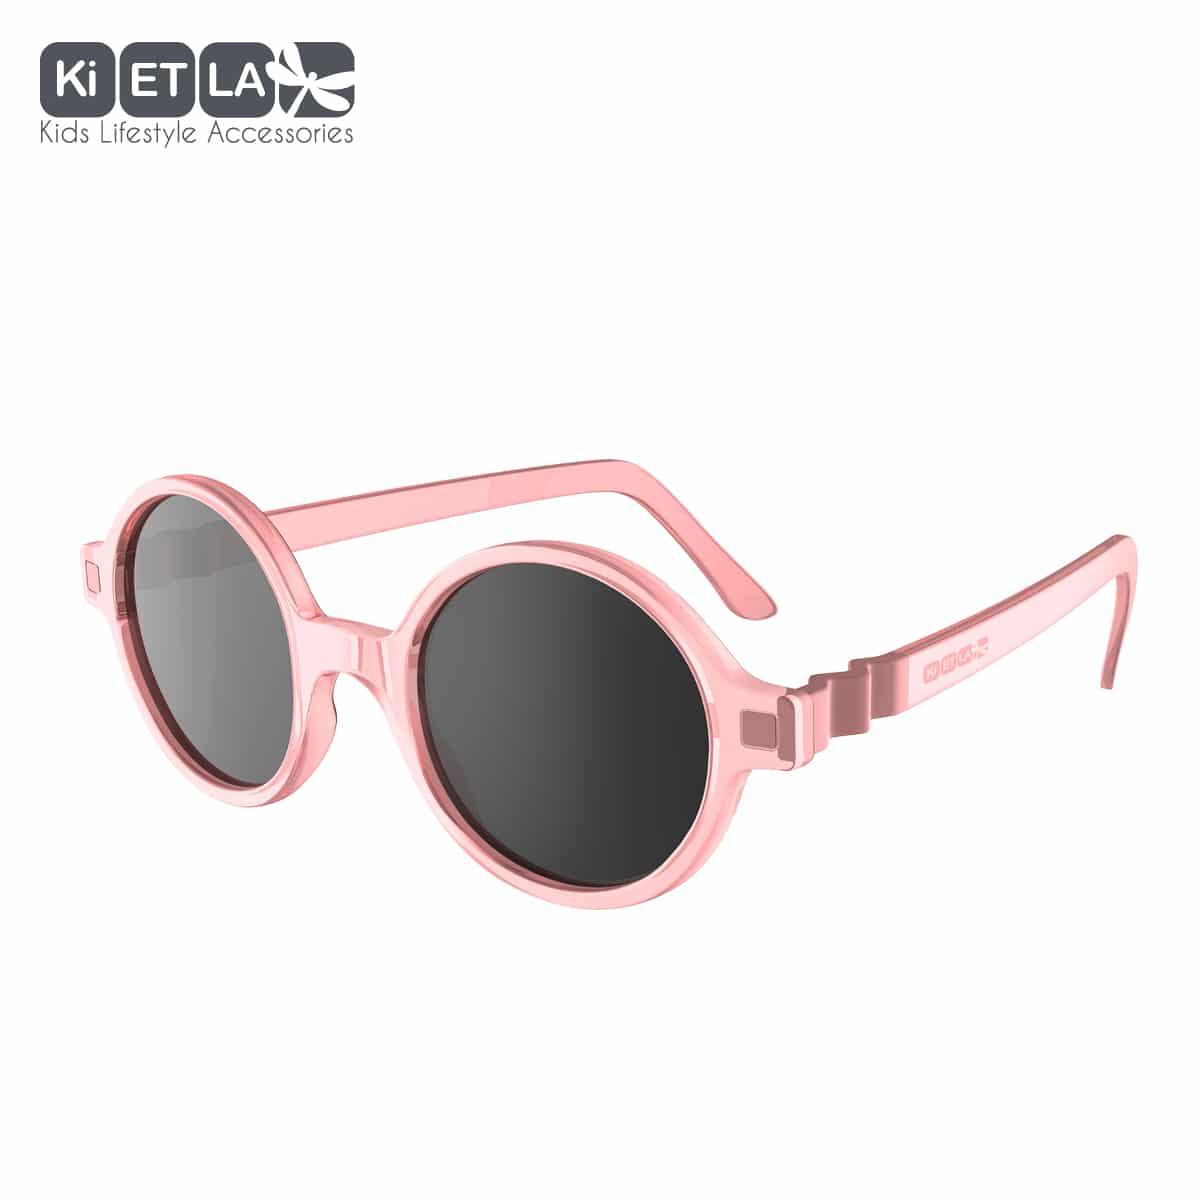 KiETLA CraZyg-Zag slnečné okuliare RoZZ 6-9 rokov